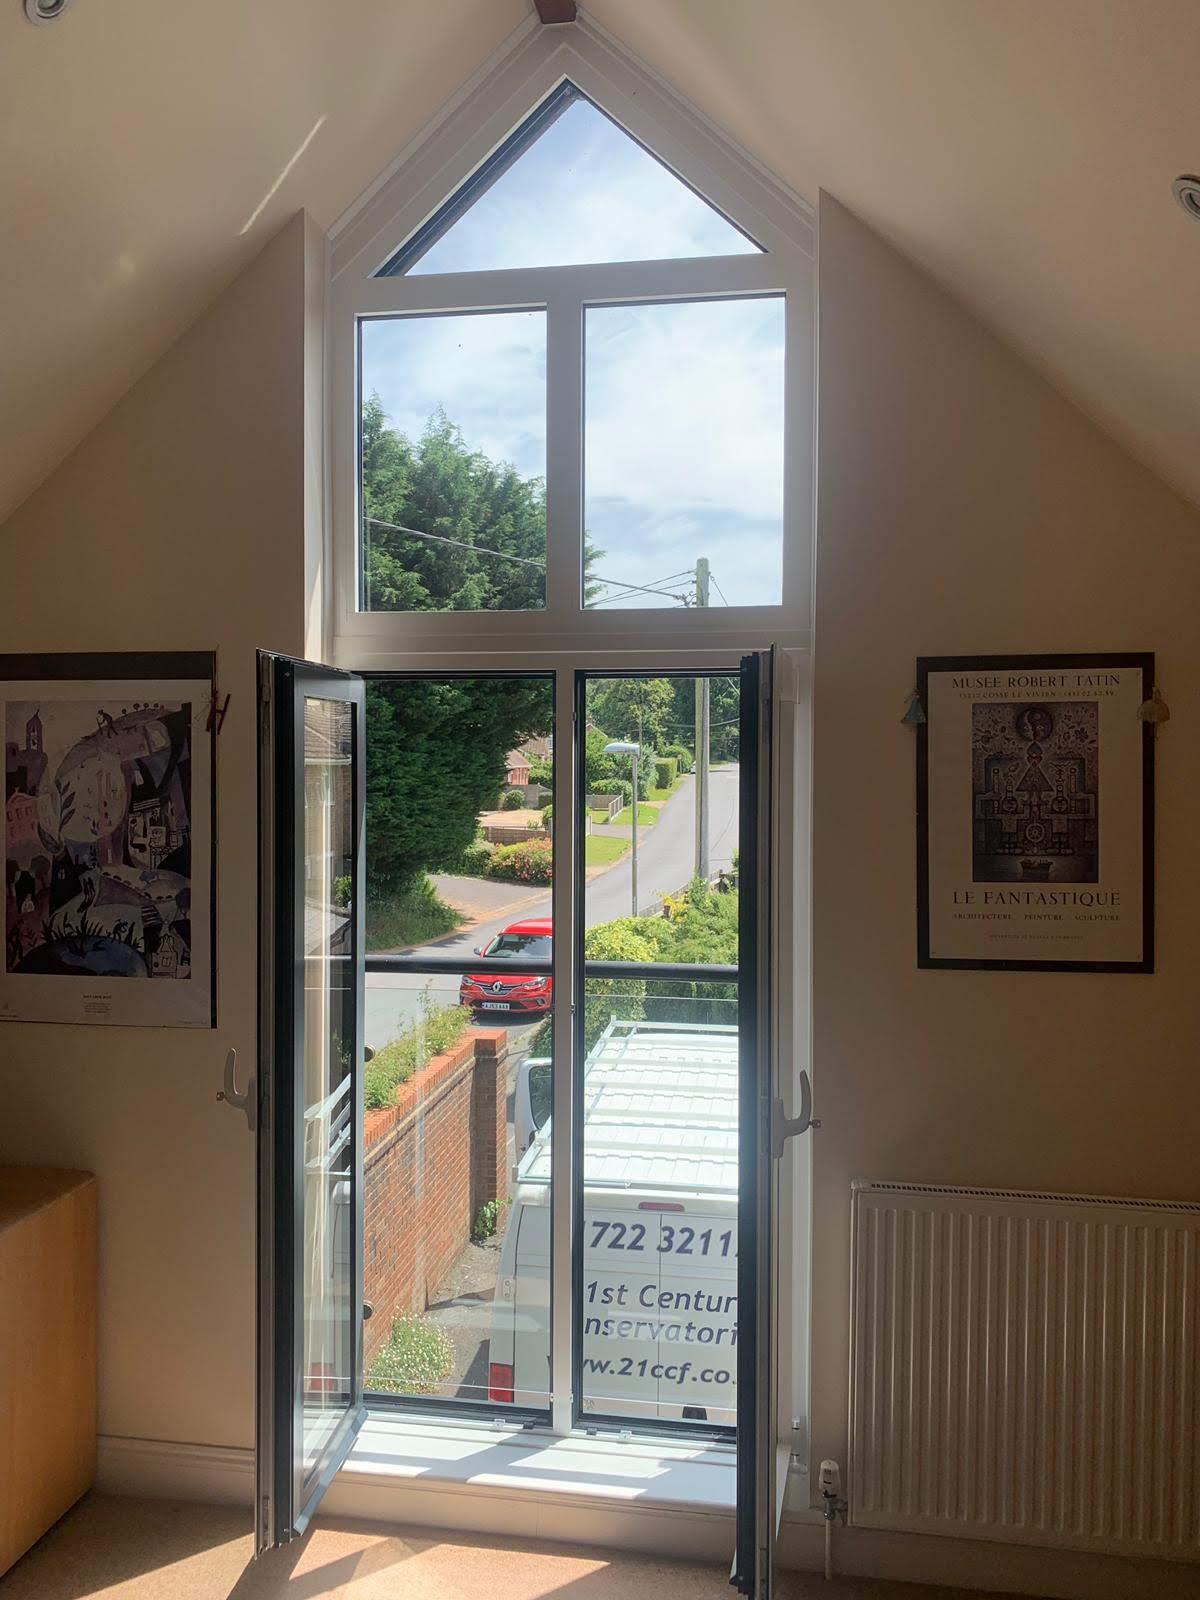 Inside shot of a shaped window installation.